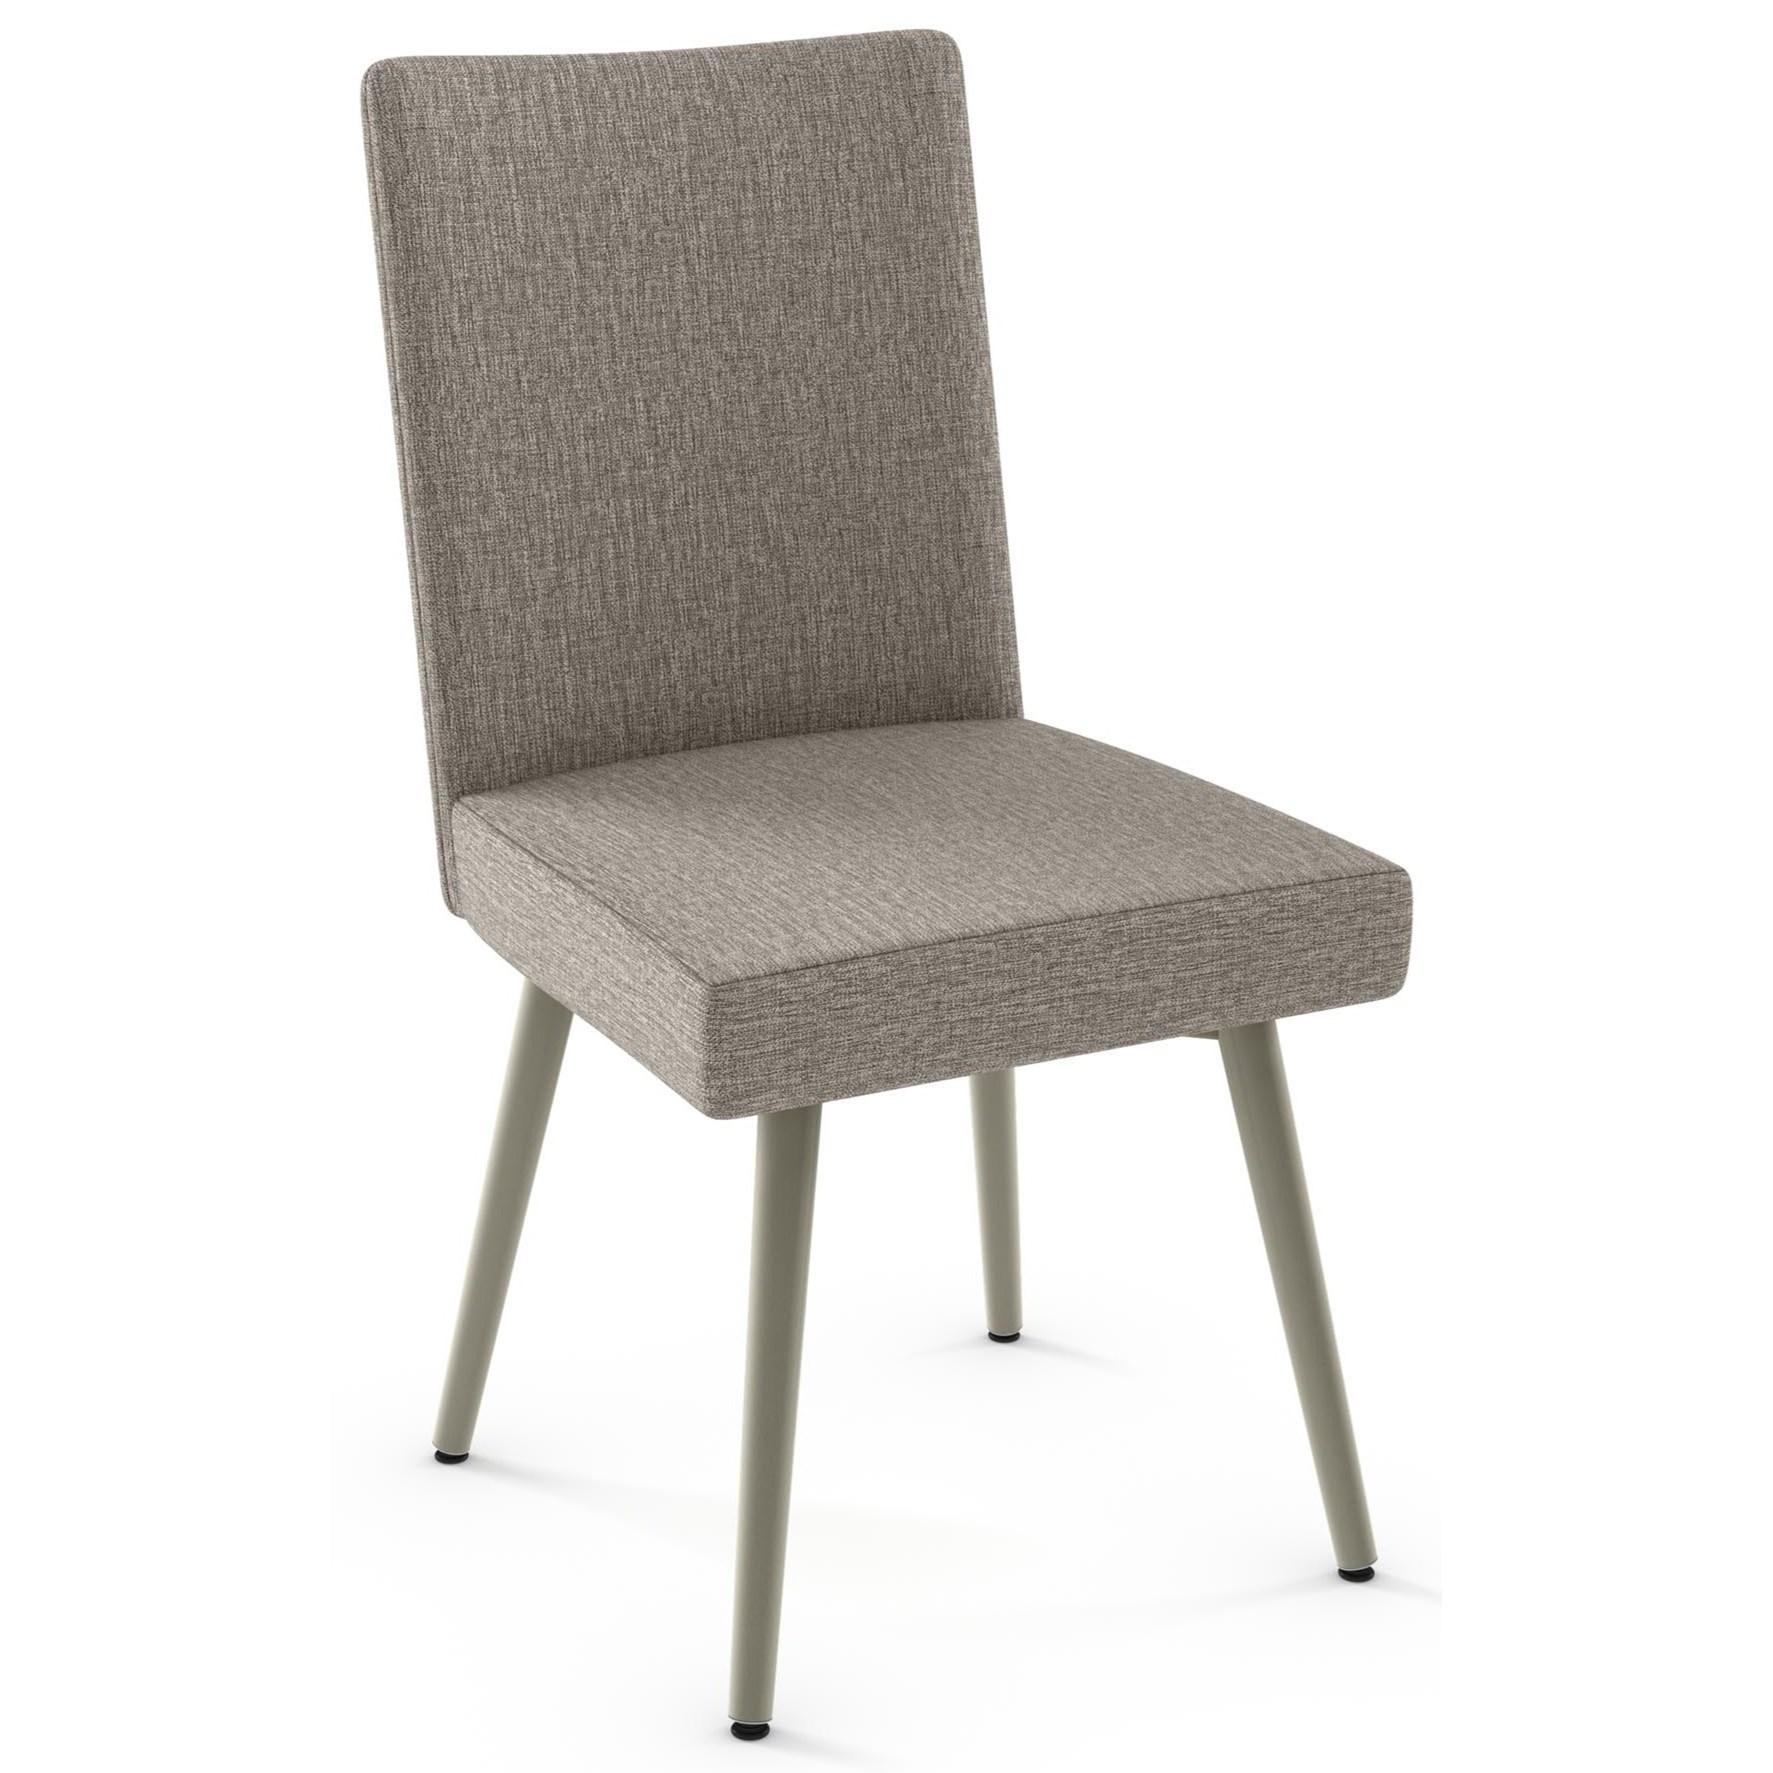 Boudoir Webber Chair by Amisco at Jordan's Home Furnishings